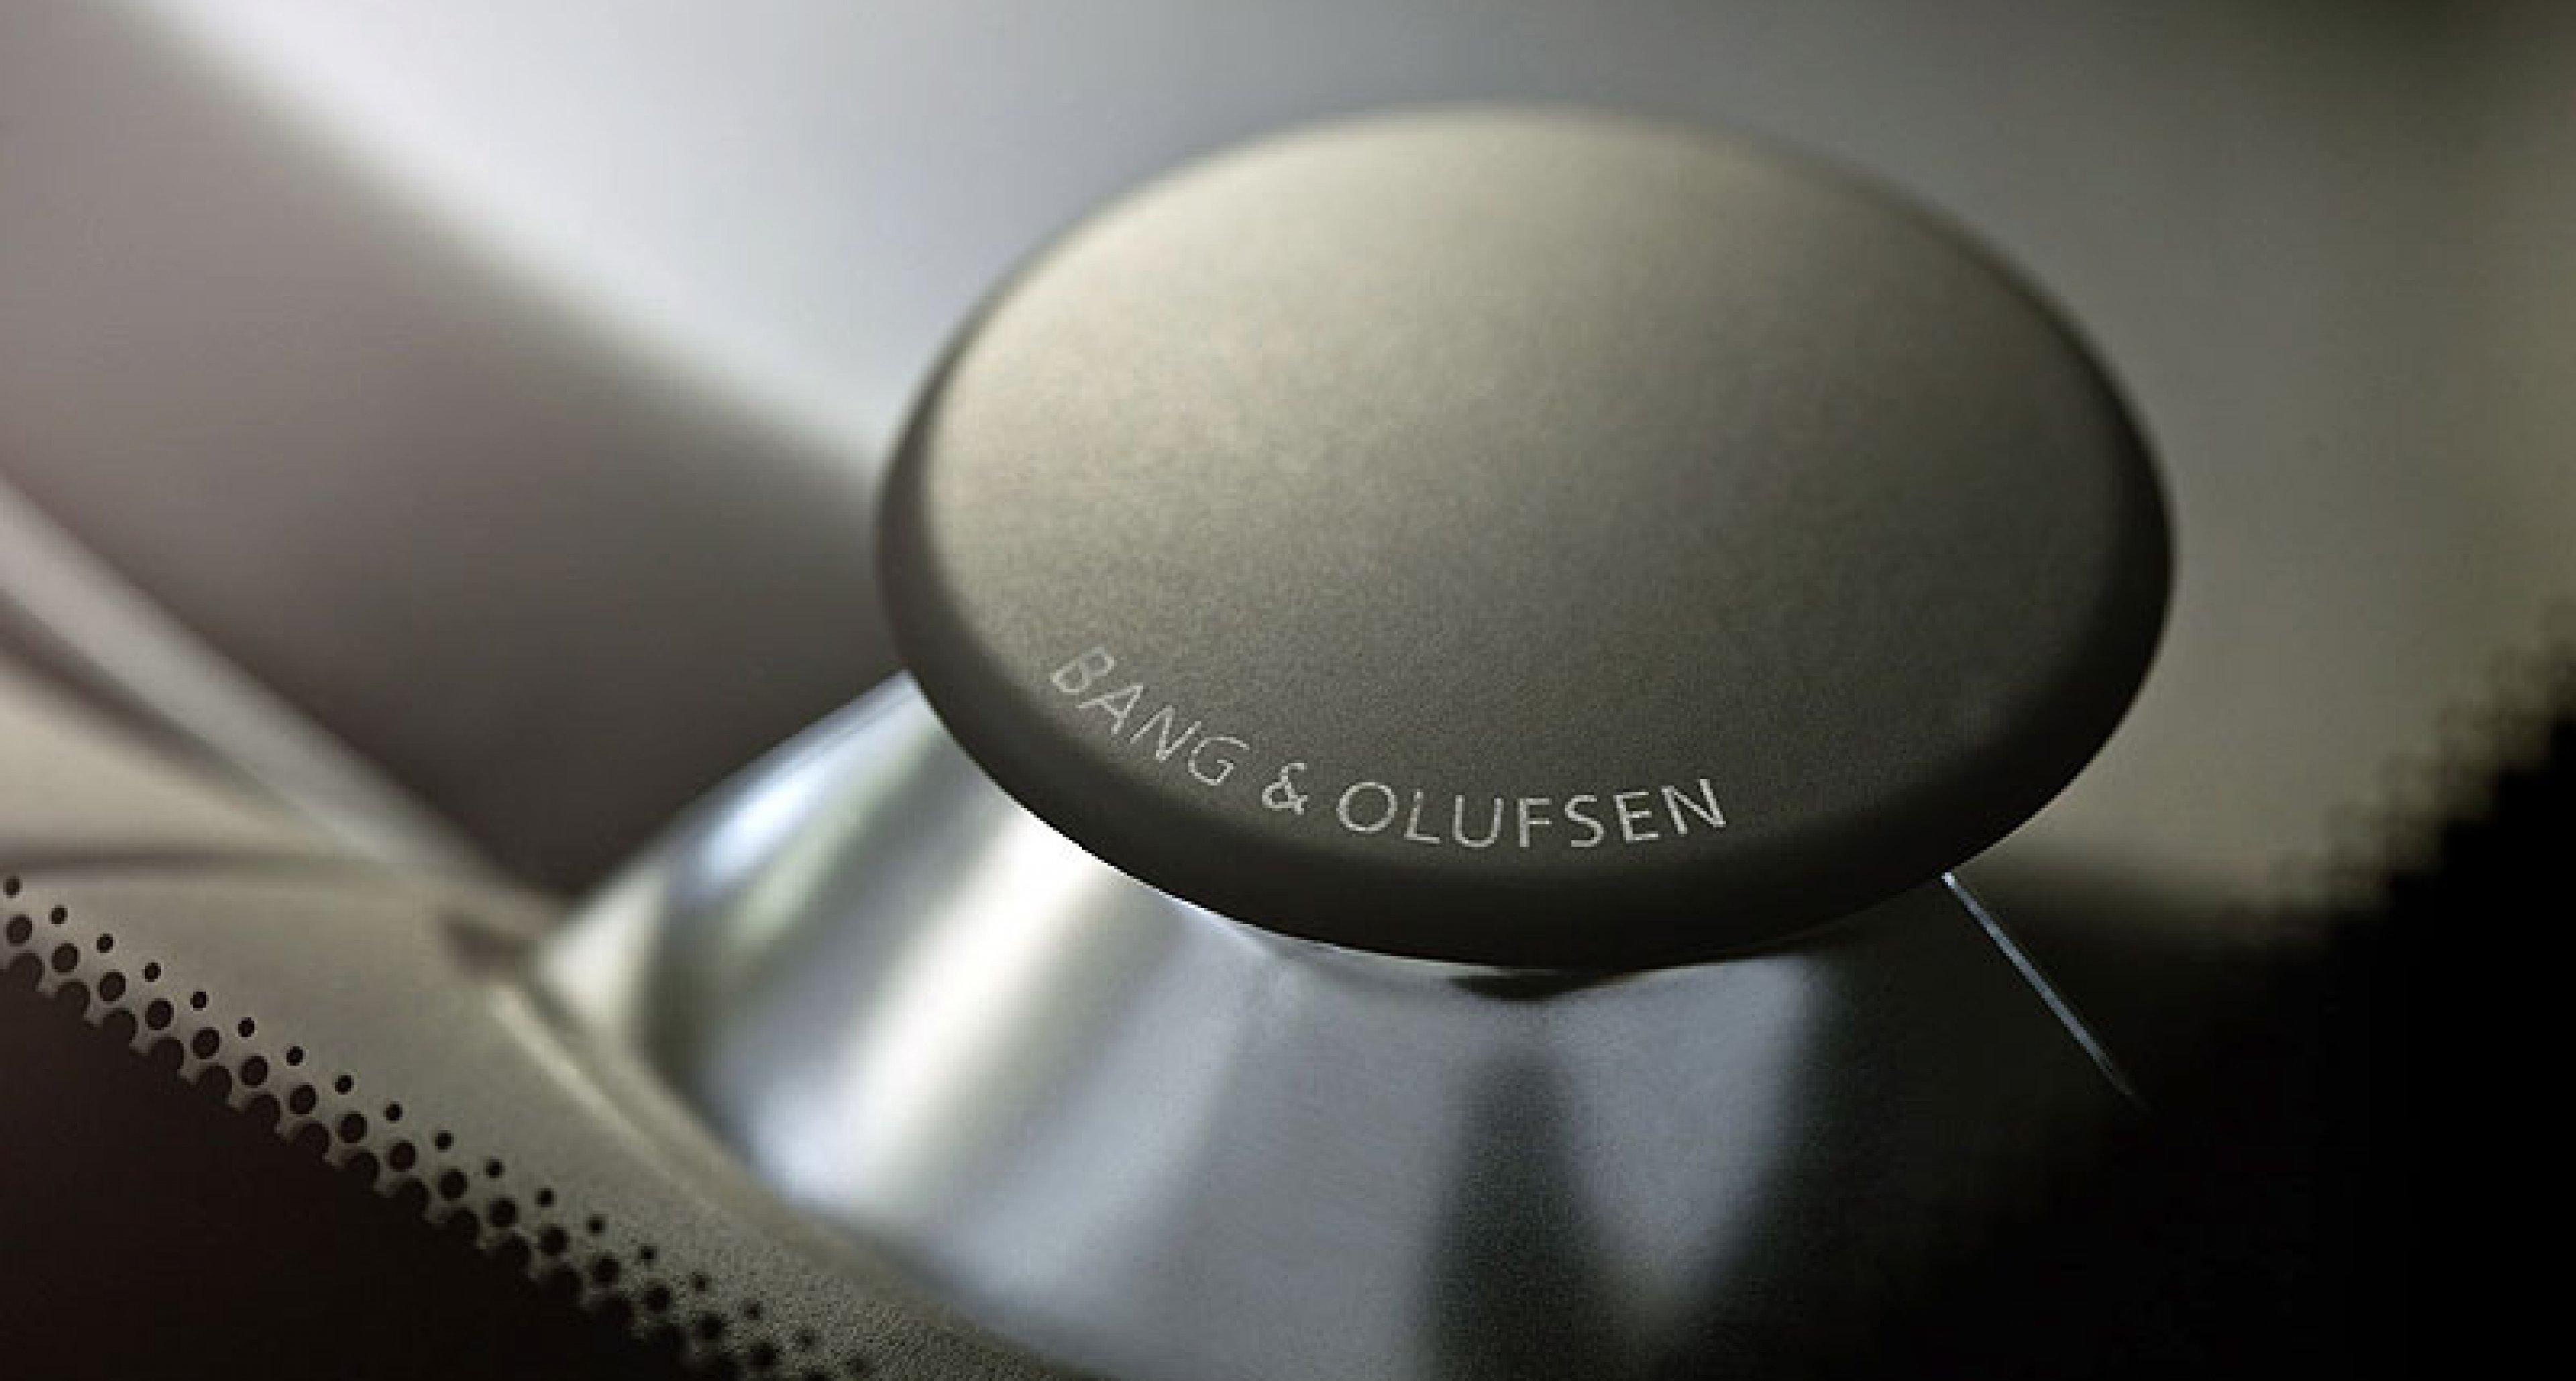 Bang & Olufsen x SLS AMG: Konzertflügel